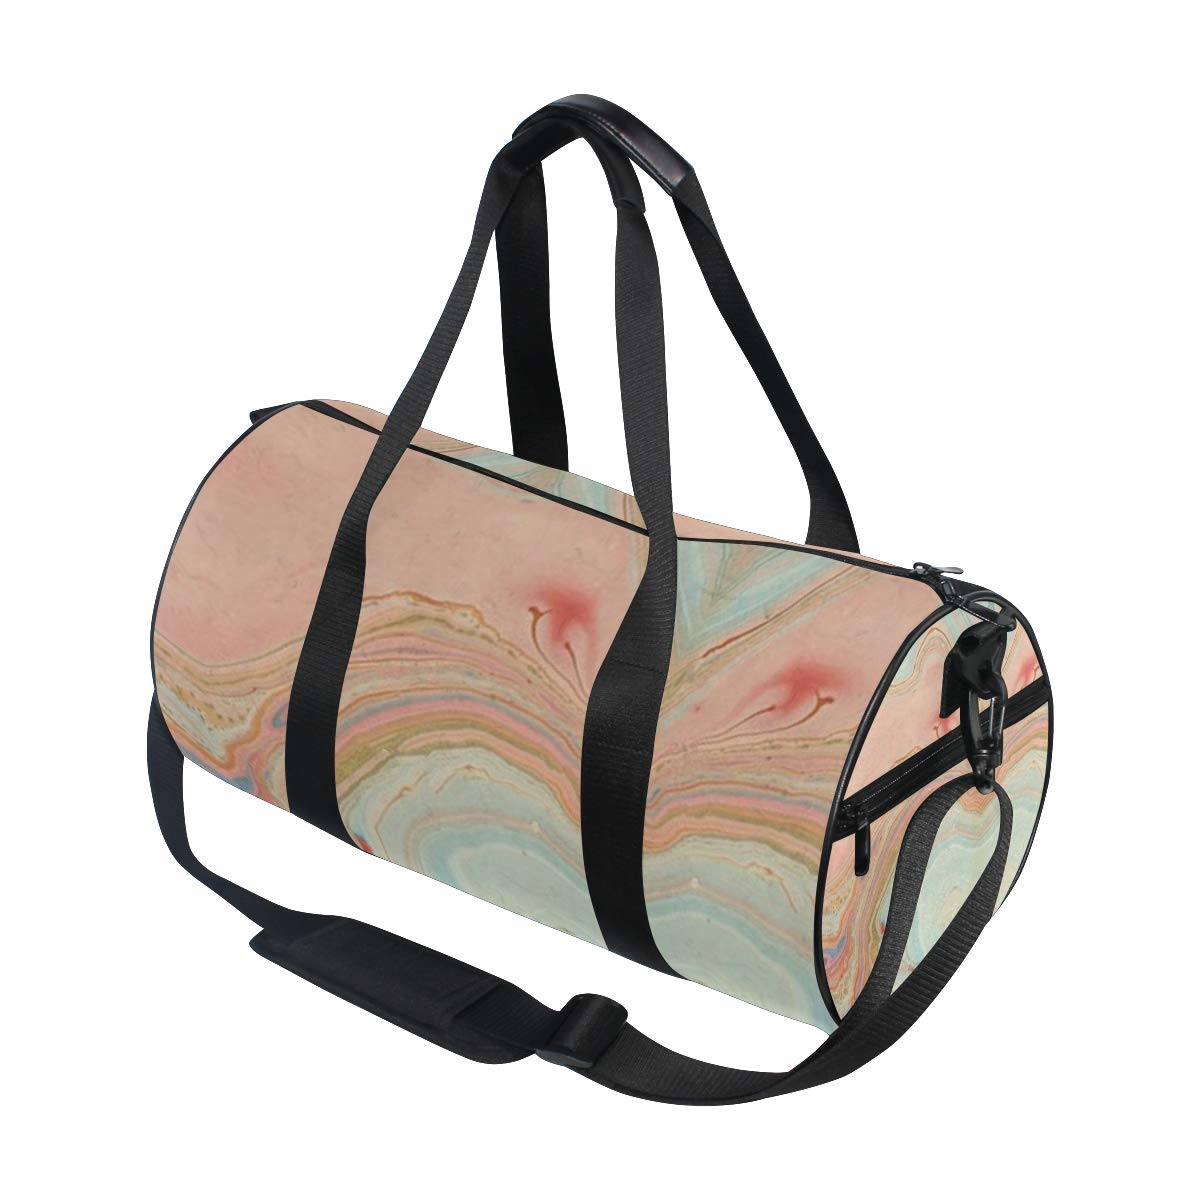 suitable for men and women. non-slip wearable handbag crossbody bag Peach Marble SwirlPopular casual fitness bag sports bag